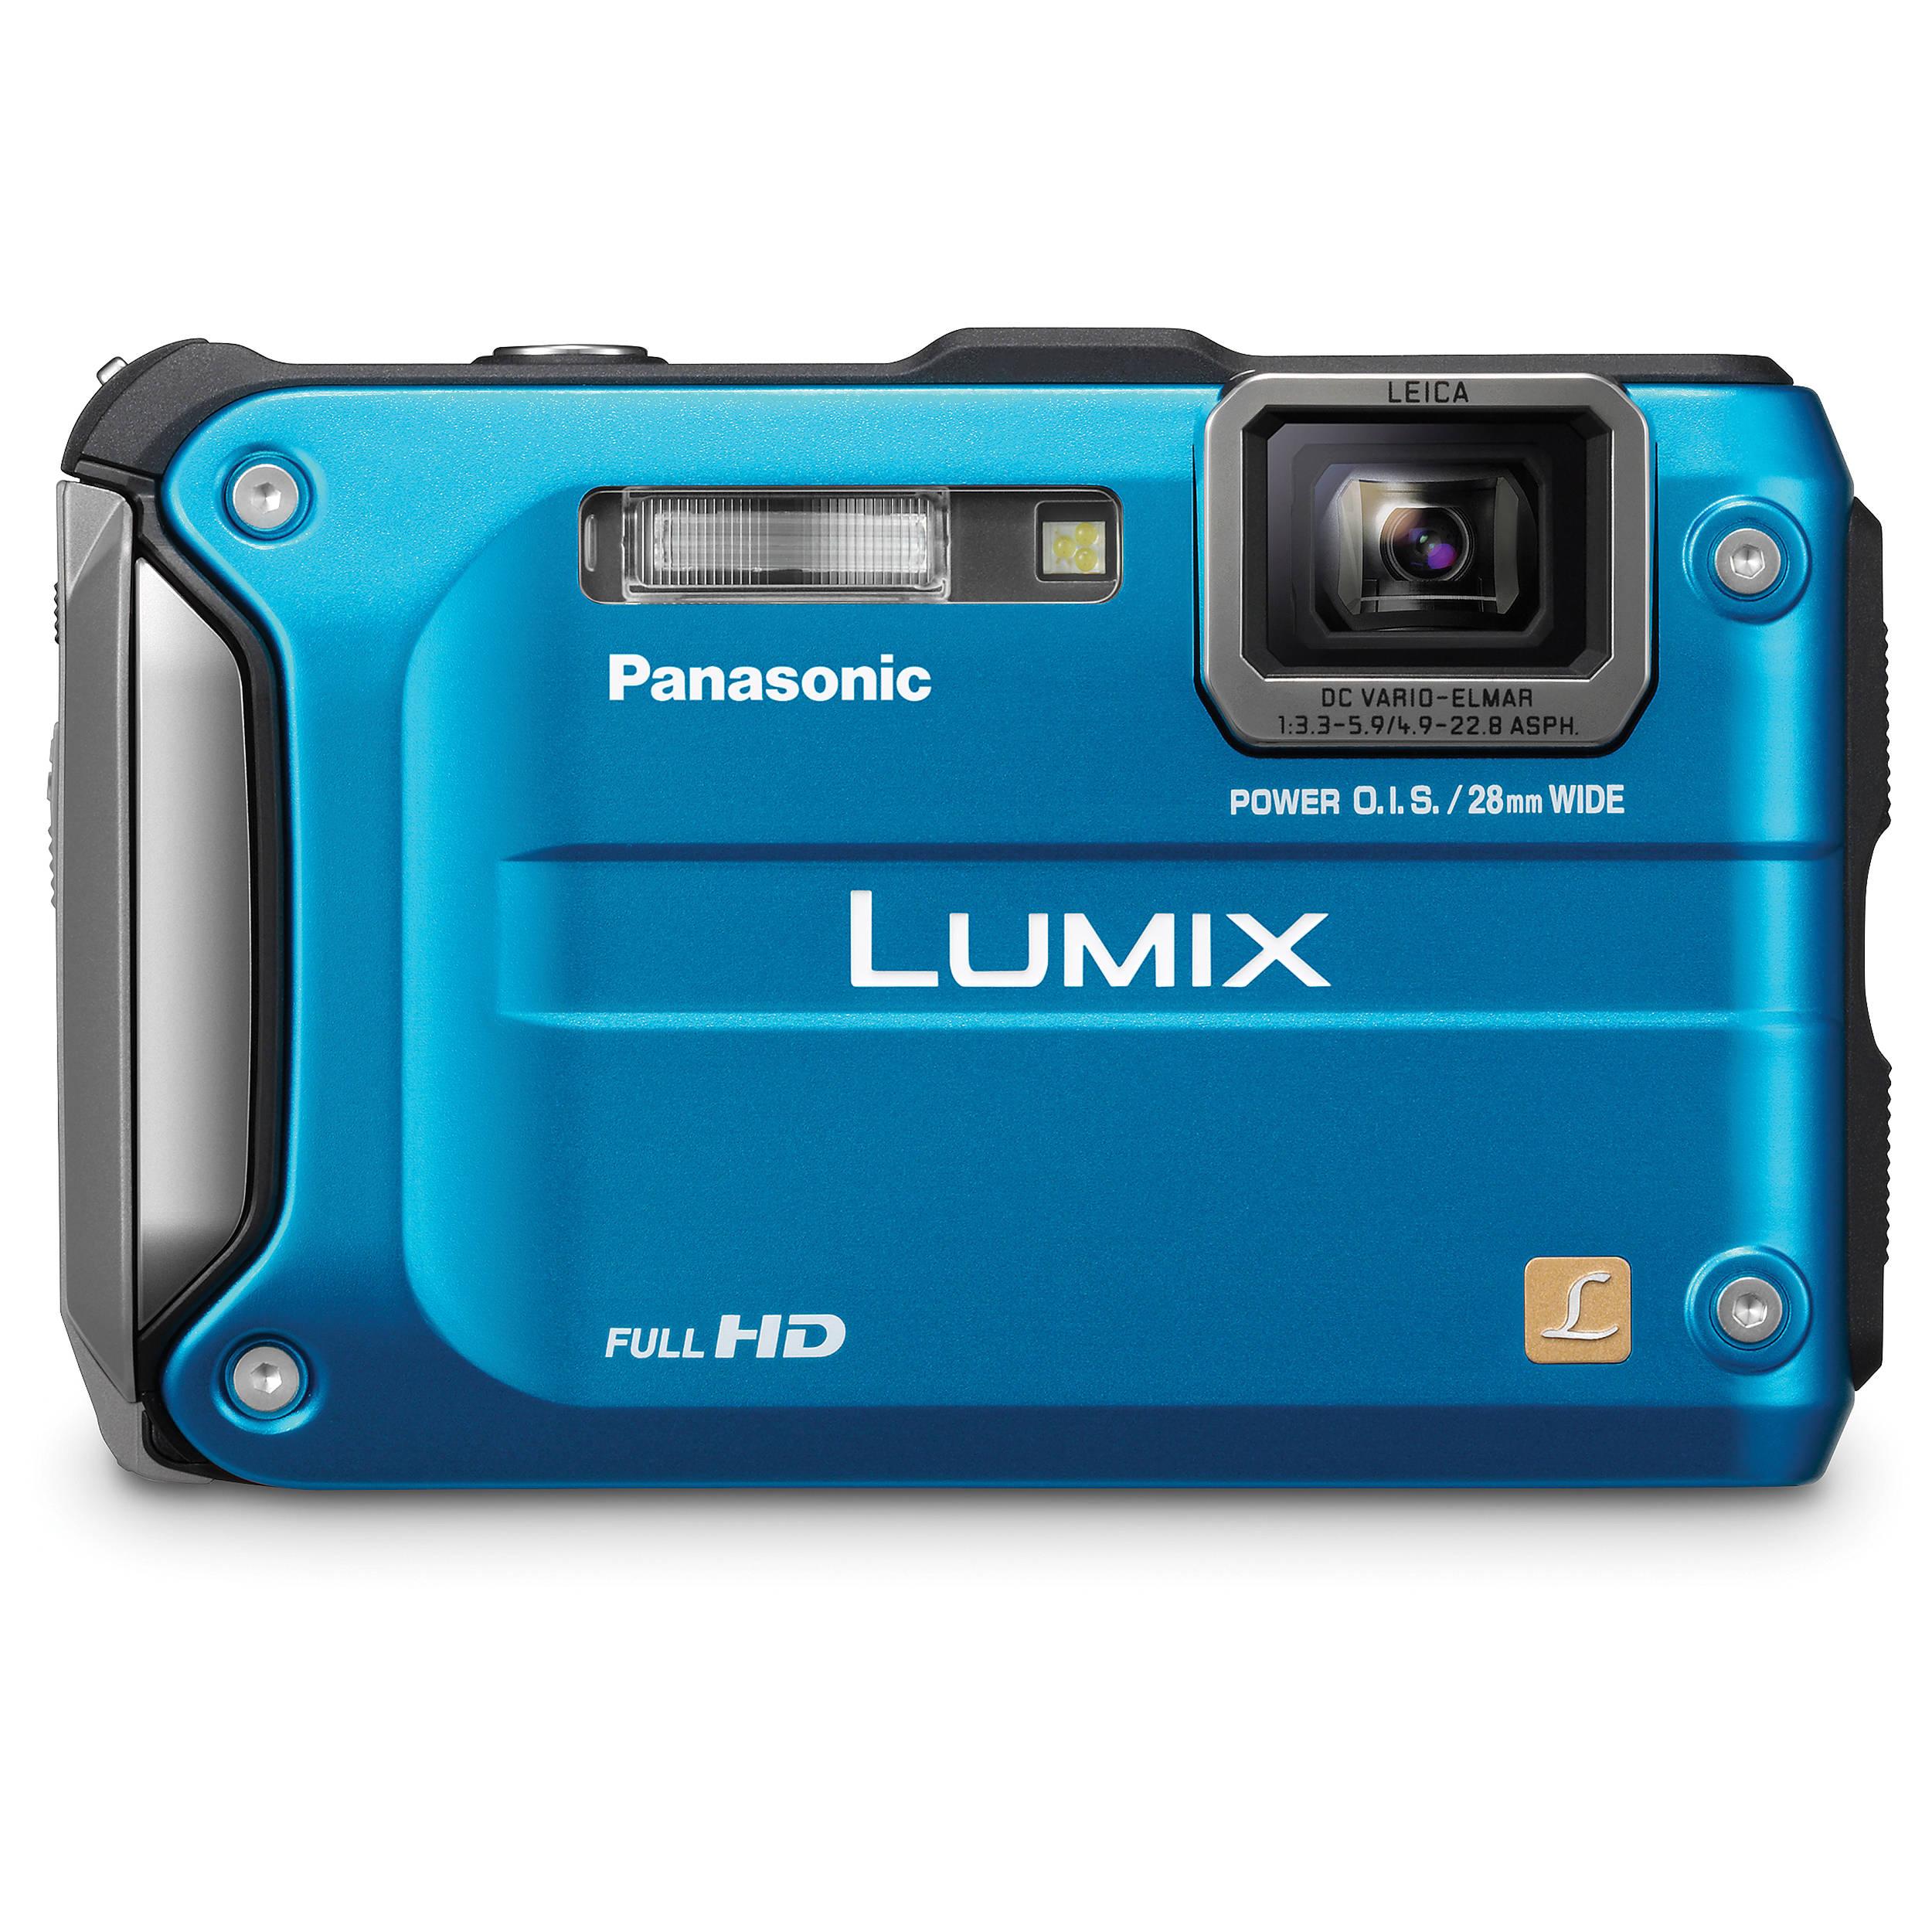 panasonic lumix dmc ts3 digital camera blue dmc ts3a b h photo rh bhphotovideo com panasonic dmc-ts3 manual panasonic ts3 manual